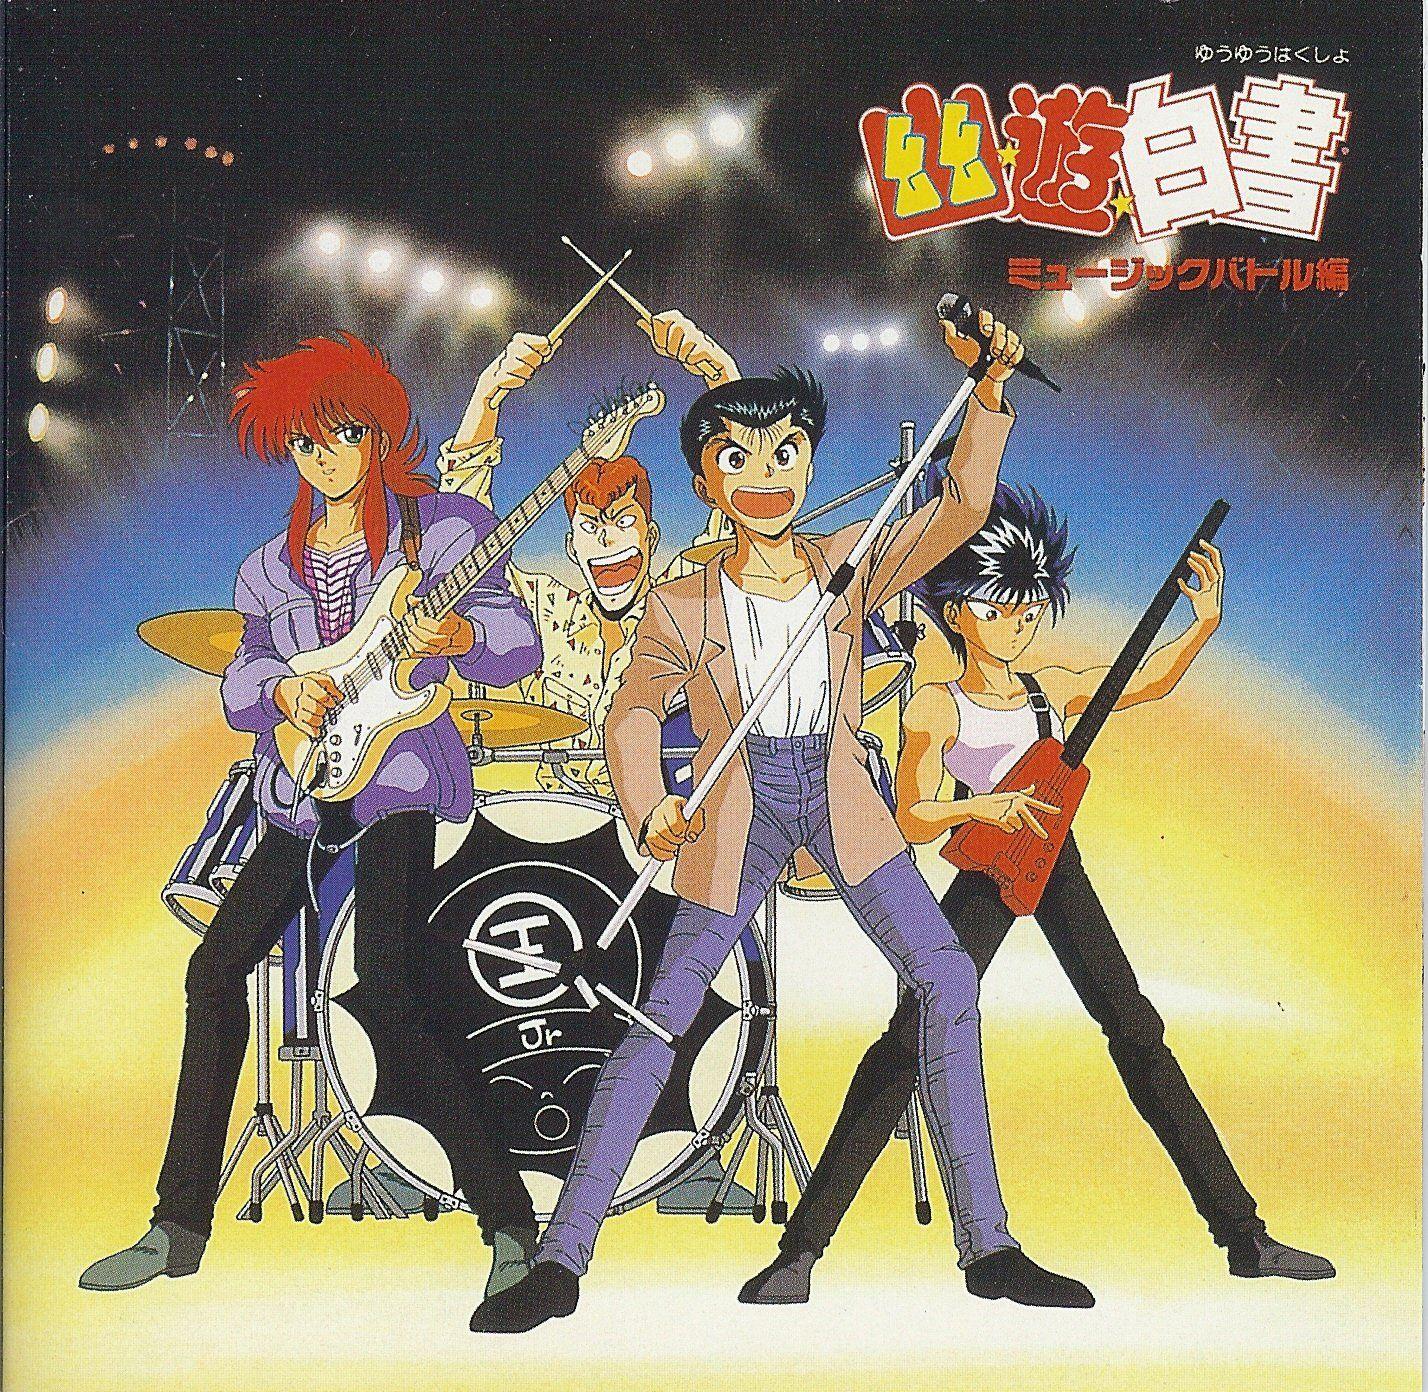 Rockin It Old School Yu Yu Hakusho Anime Anime Guys Anime Shows